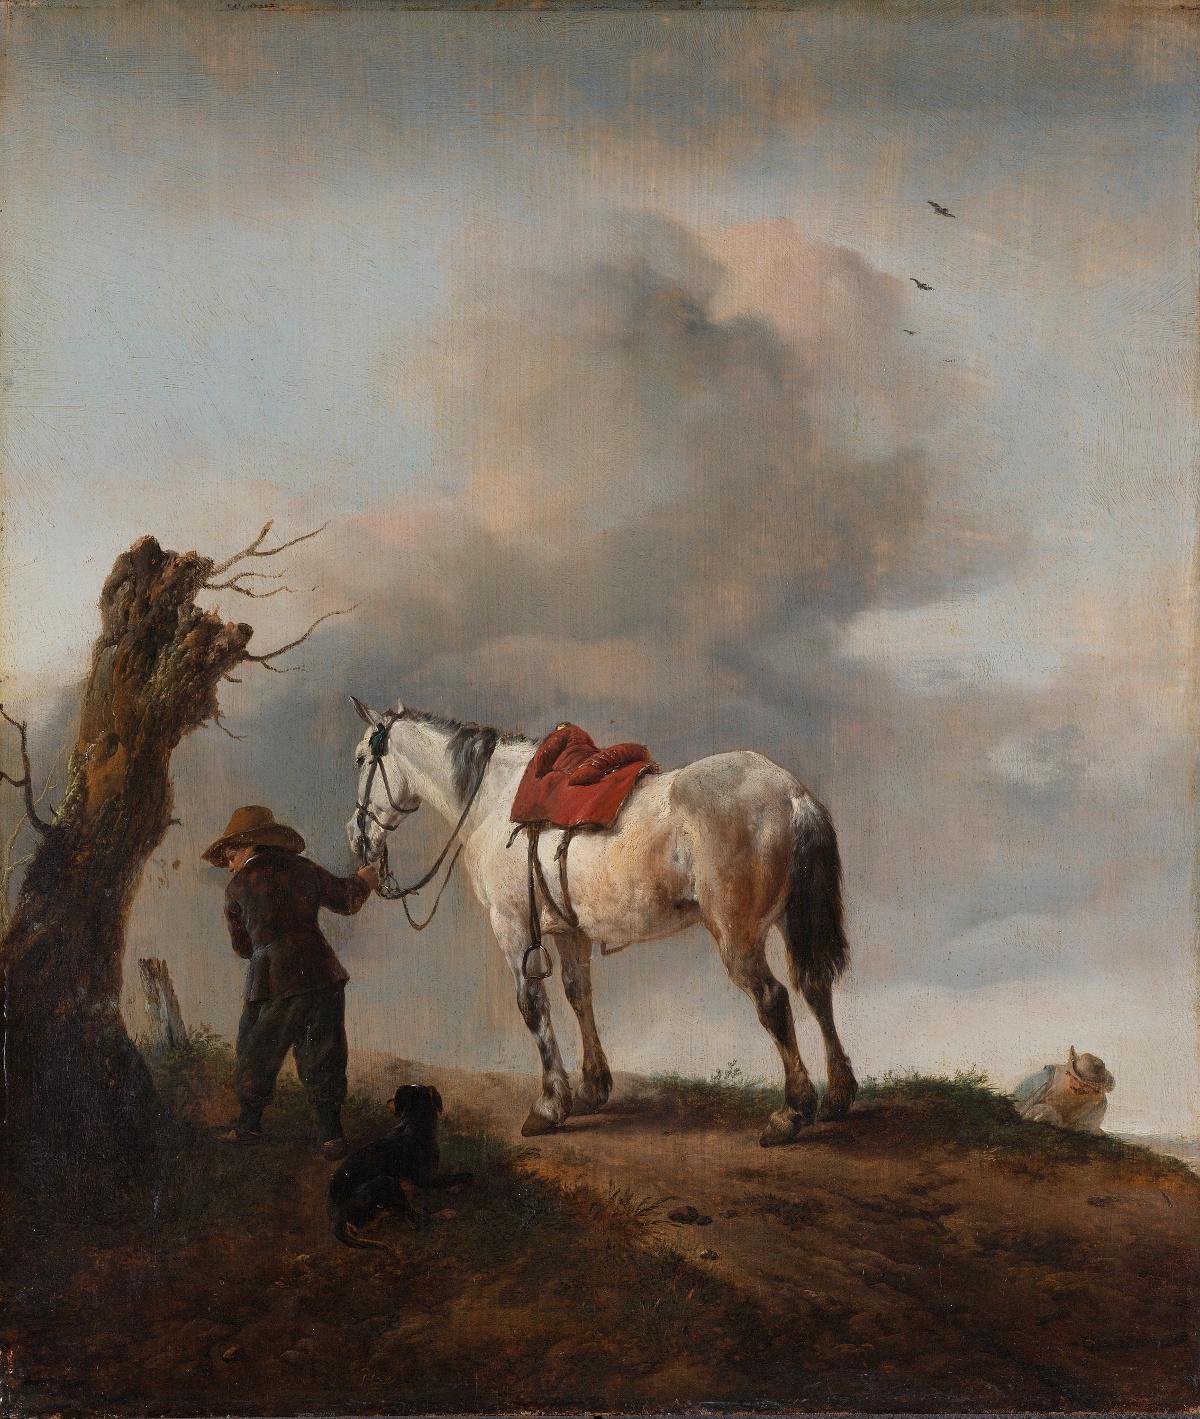 "1646, Öl auf Leinwand, 43,5 cm x 38 cm, Amsterdam, Rijksmuseum, Inv.-Nr. SK-A-1610.<br> Quelle: <a href=""https://commons.wikimedia.org/wiki/File:De_schimmel_Rijksmuseum_SK-A-1610.jpeg"">User:Pimbrils / Wikimedia Commons</a> <br>Lizenz: Public Domain"